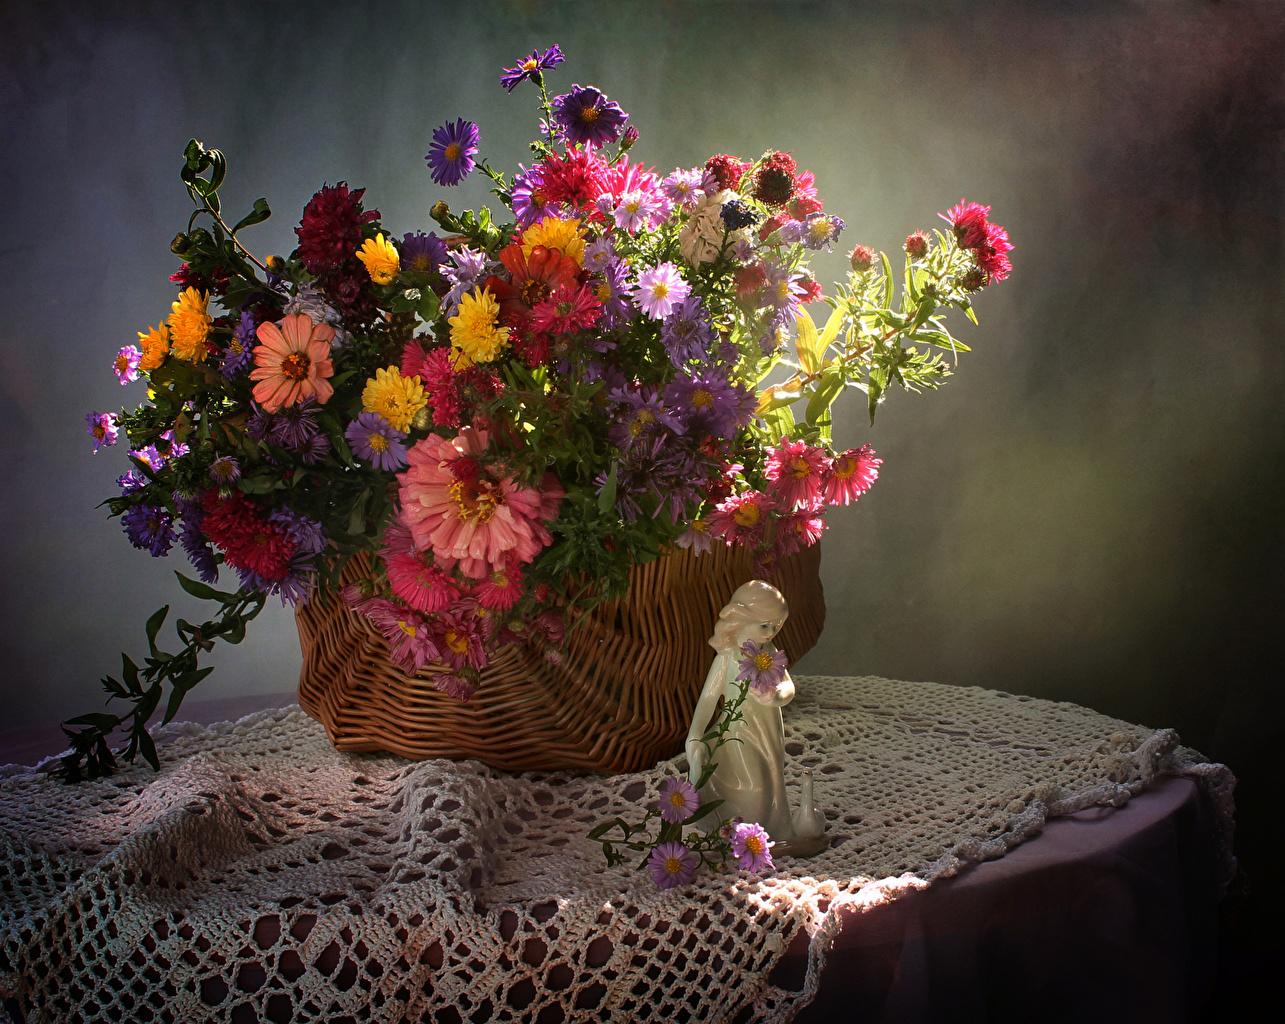 Обои Девочки Астры Цветы Корзина Стол Корзинка